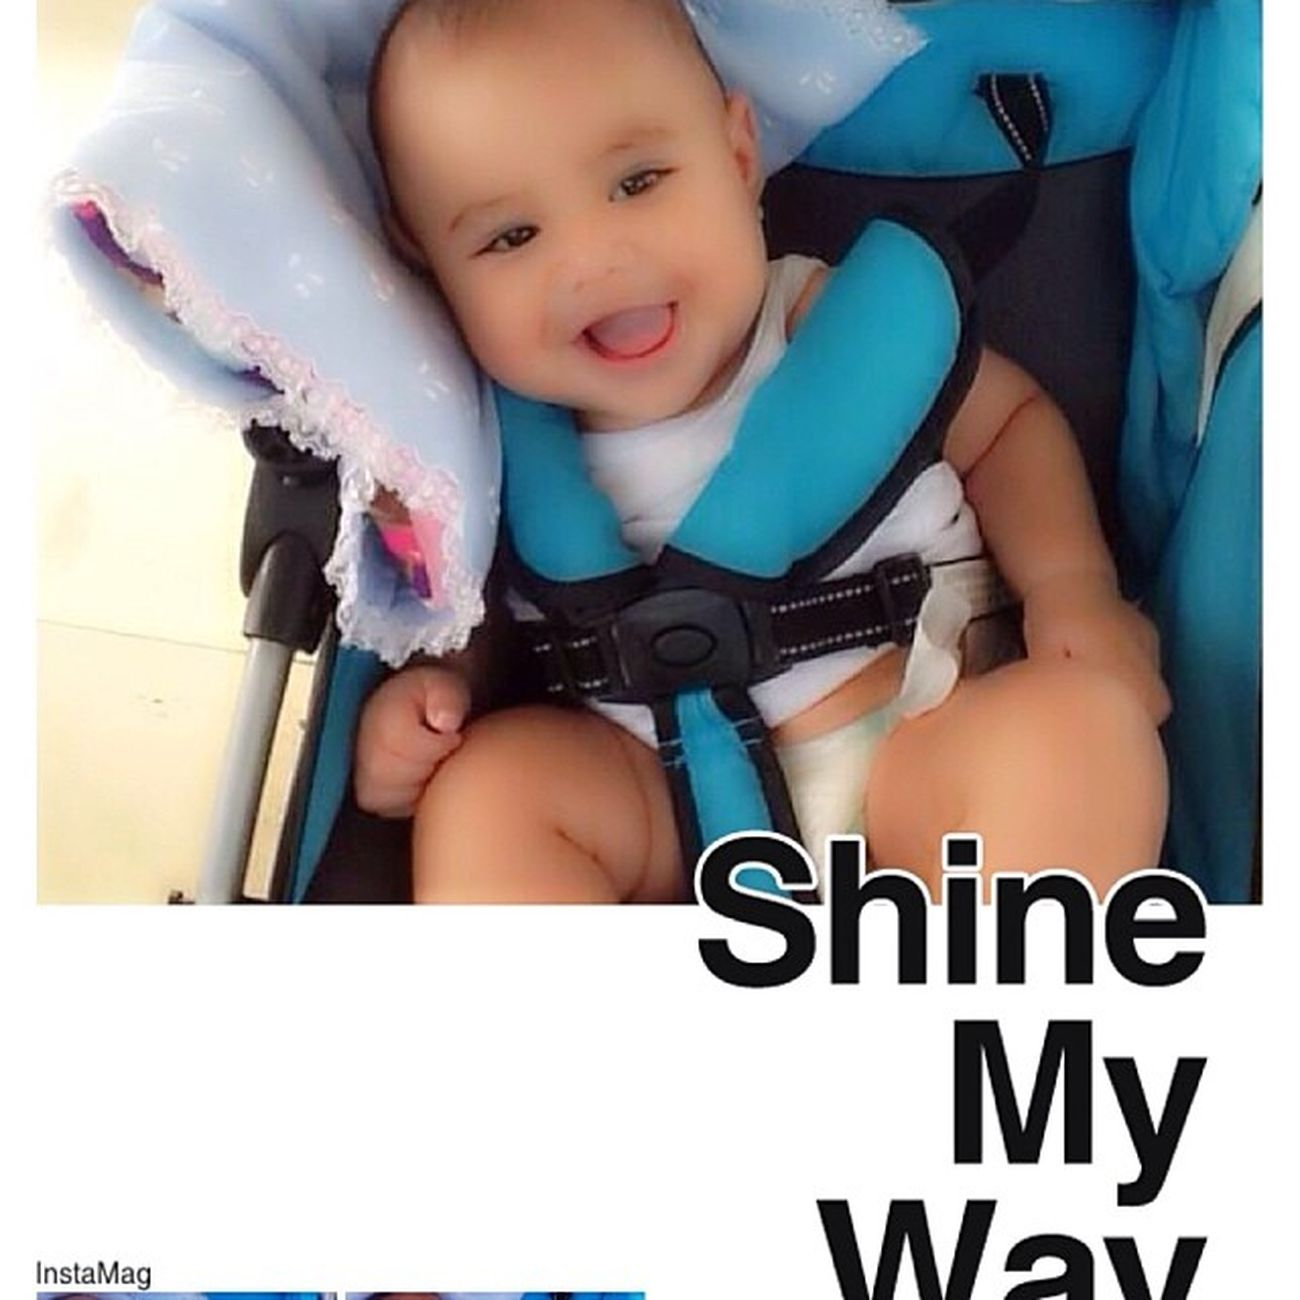 Baby jj Baby Bayi Cute Imut lucu funny gemesin